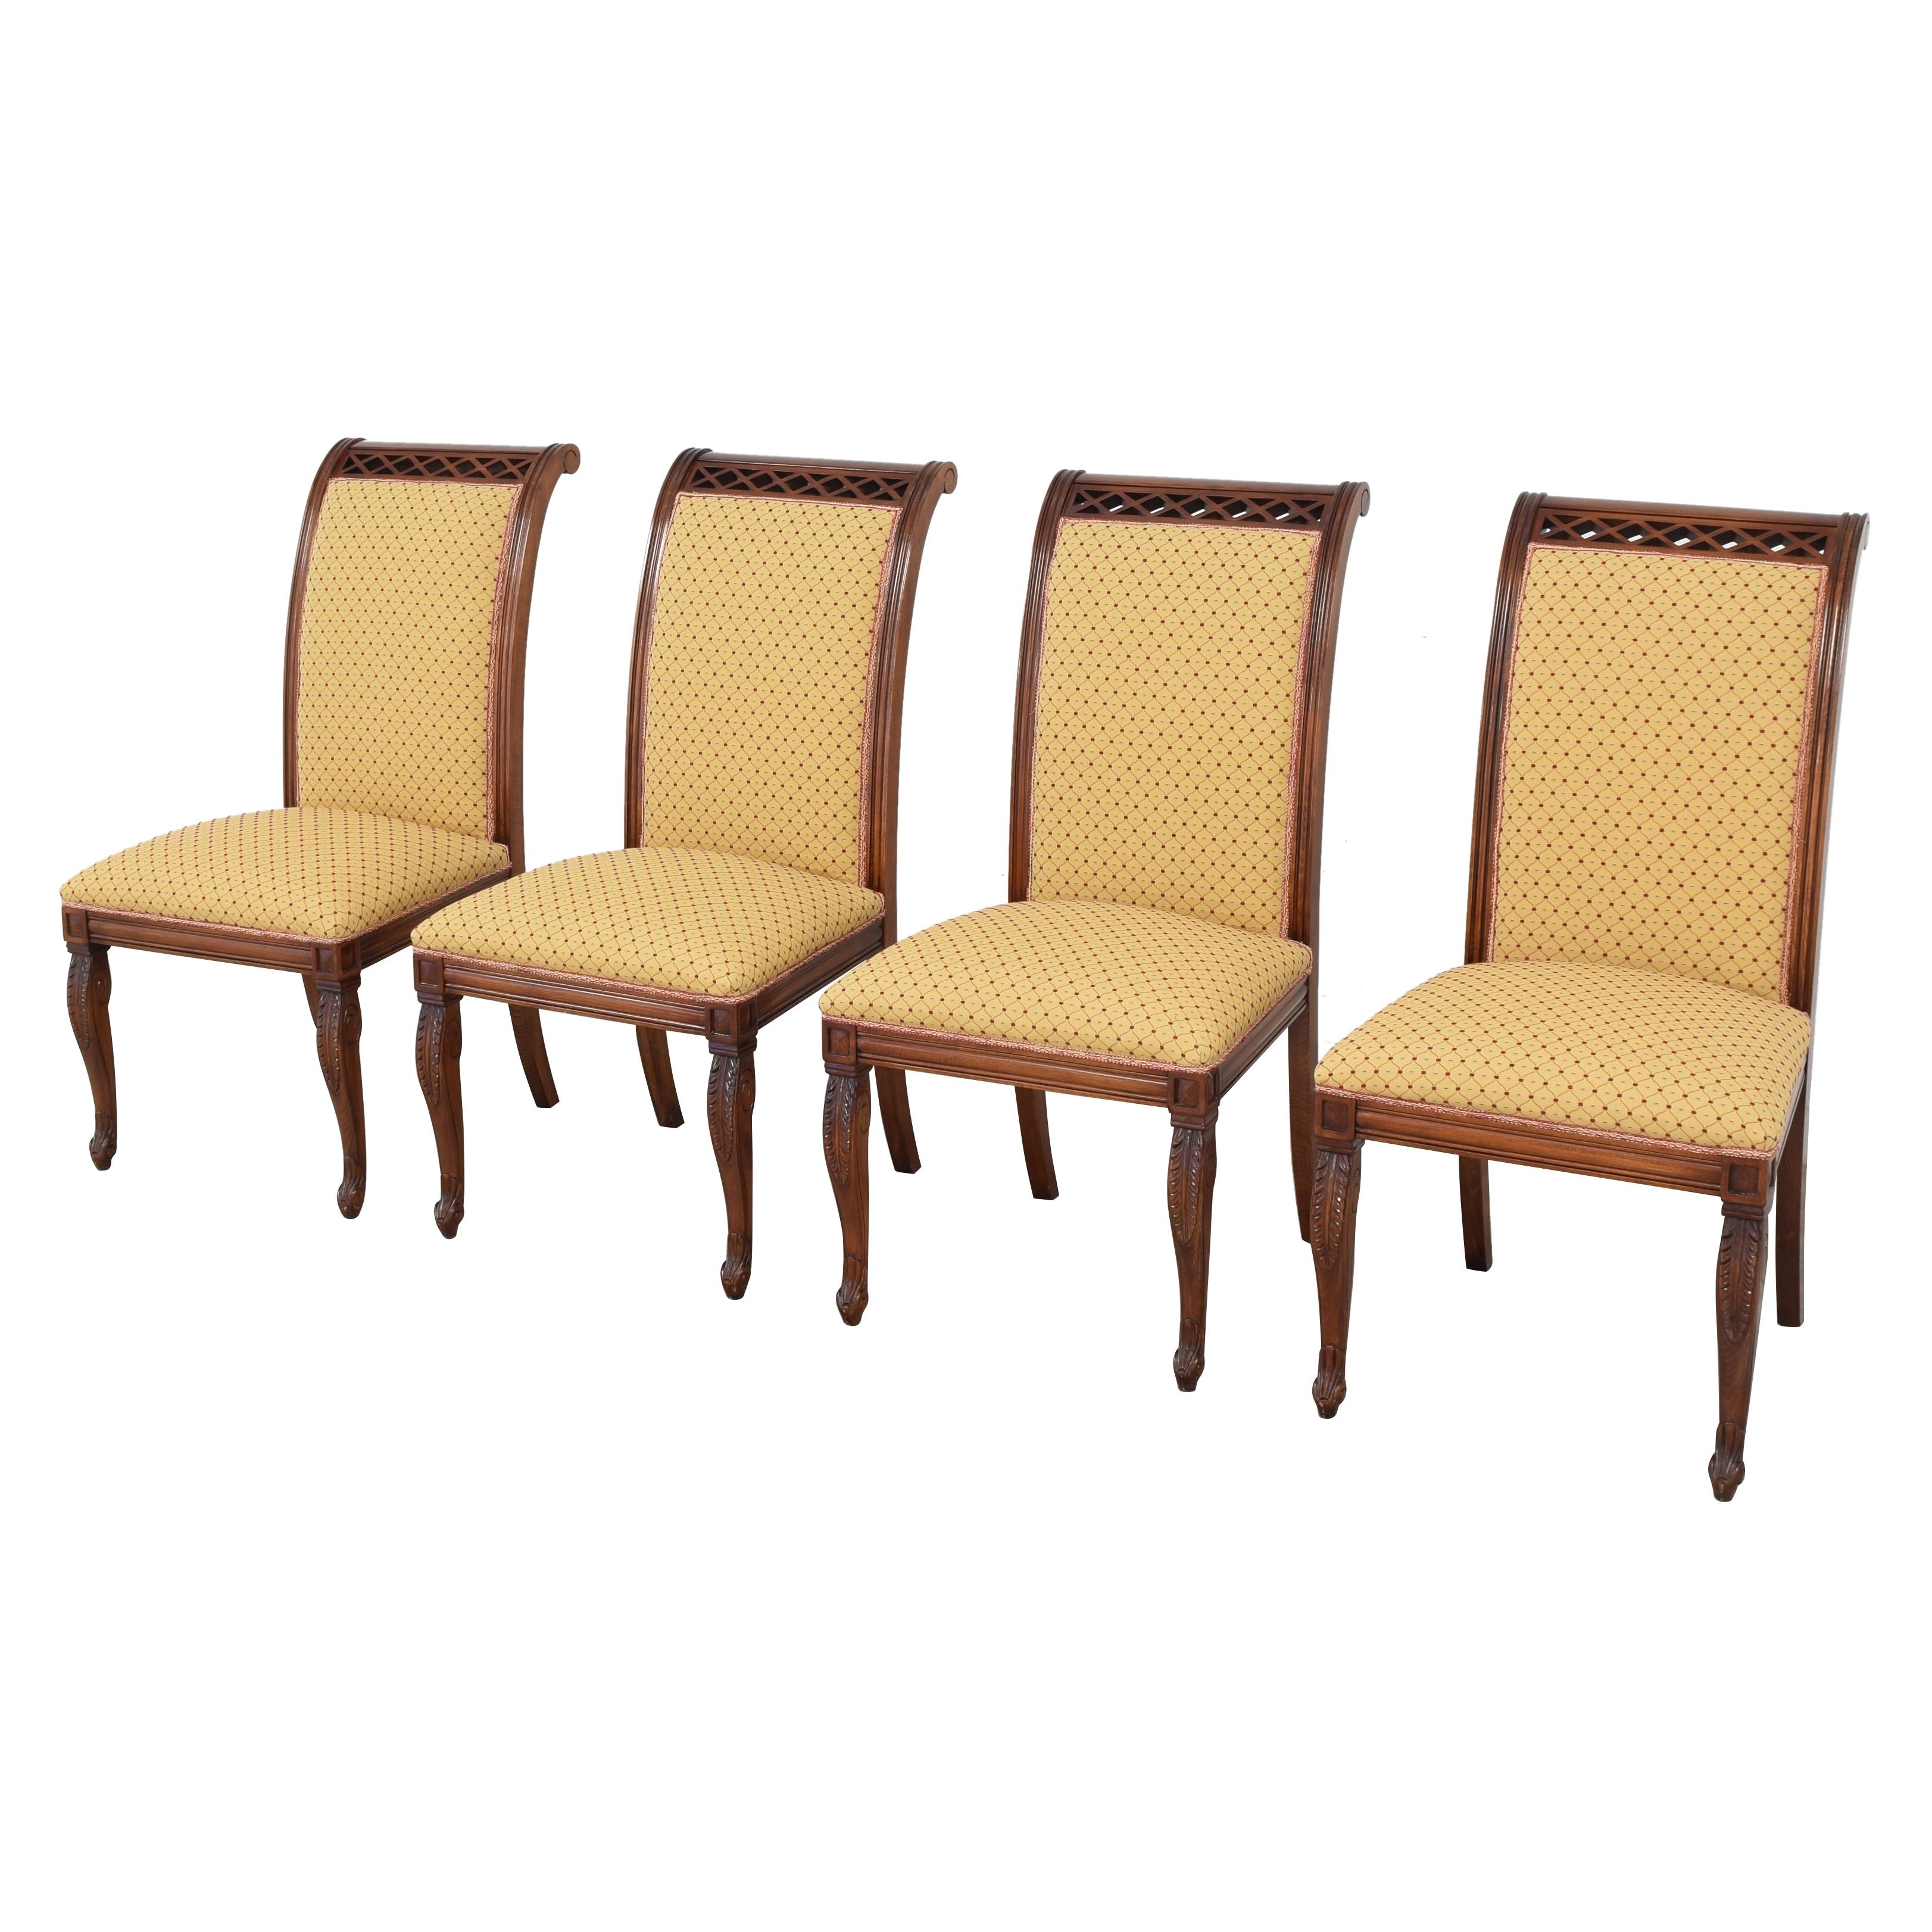 buy KPS Furnishings KPS Furnishings Custom Dining Chairs online